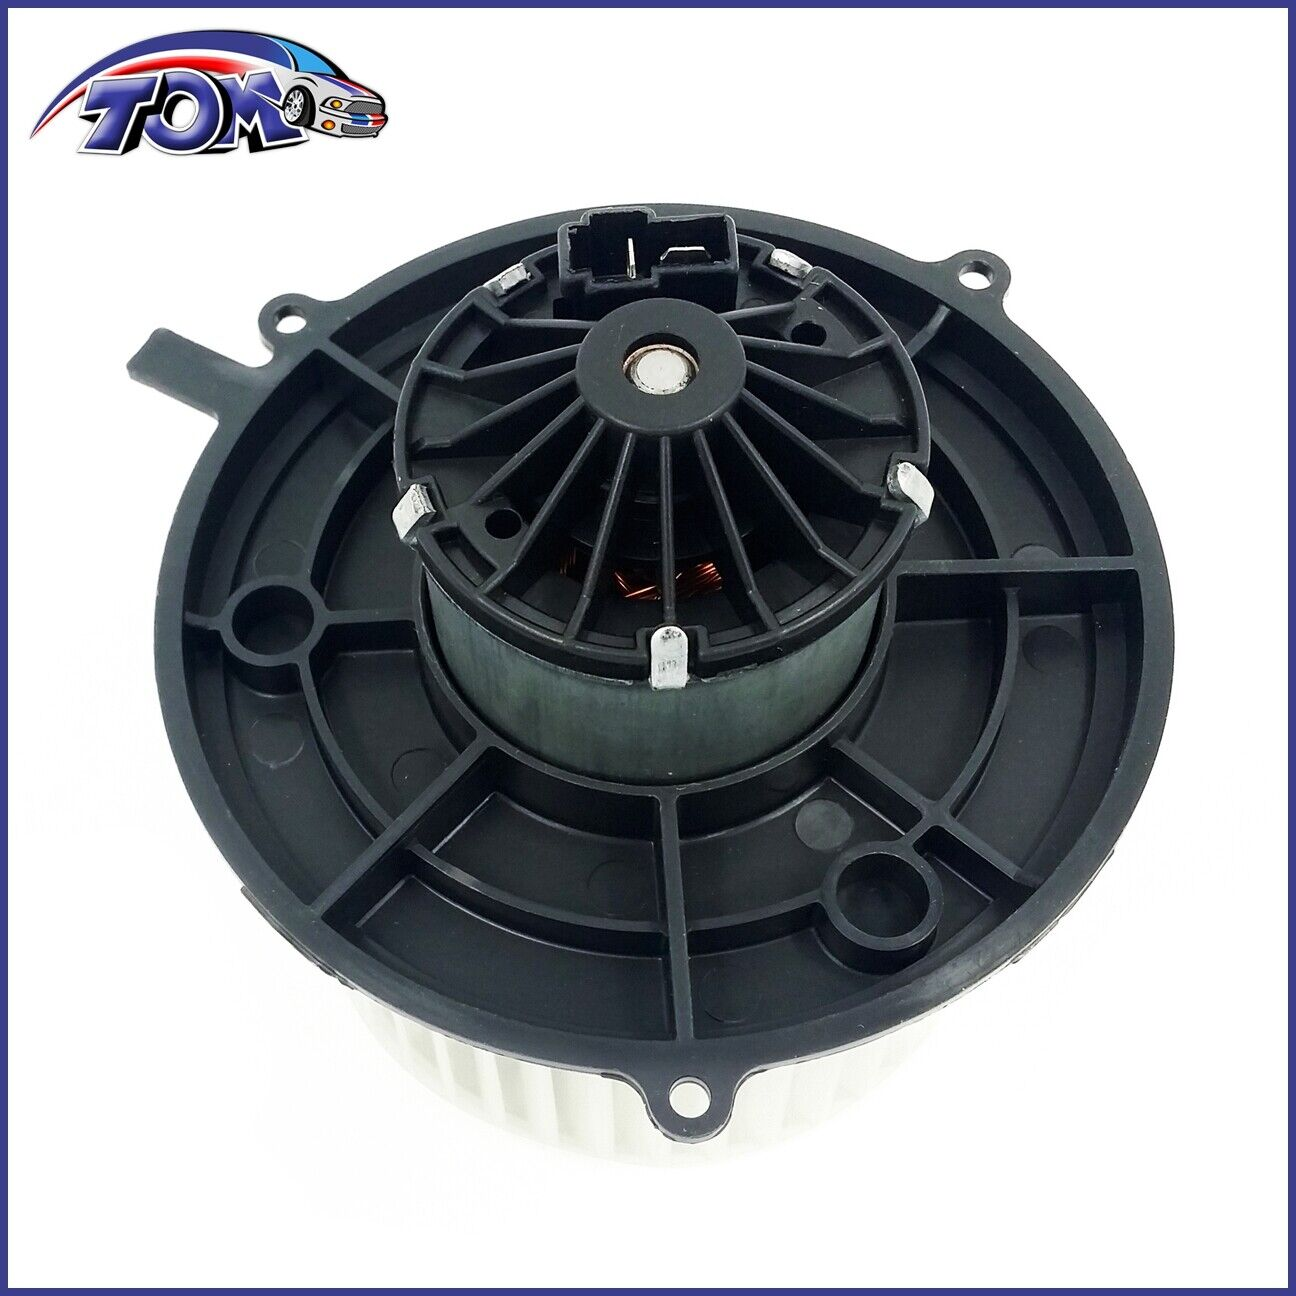 hight resolution of brand new blower motor for daihatsu terios 1997 2005 toyota terios 2002 2005